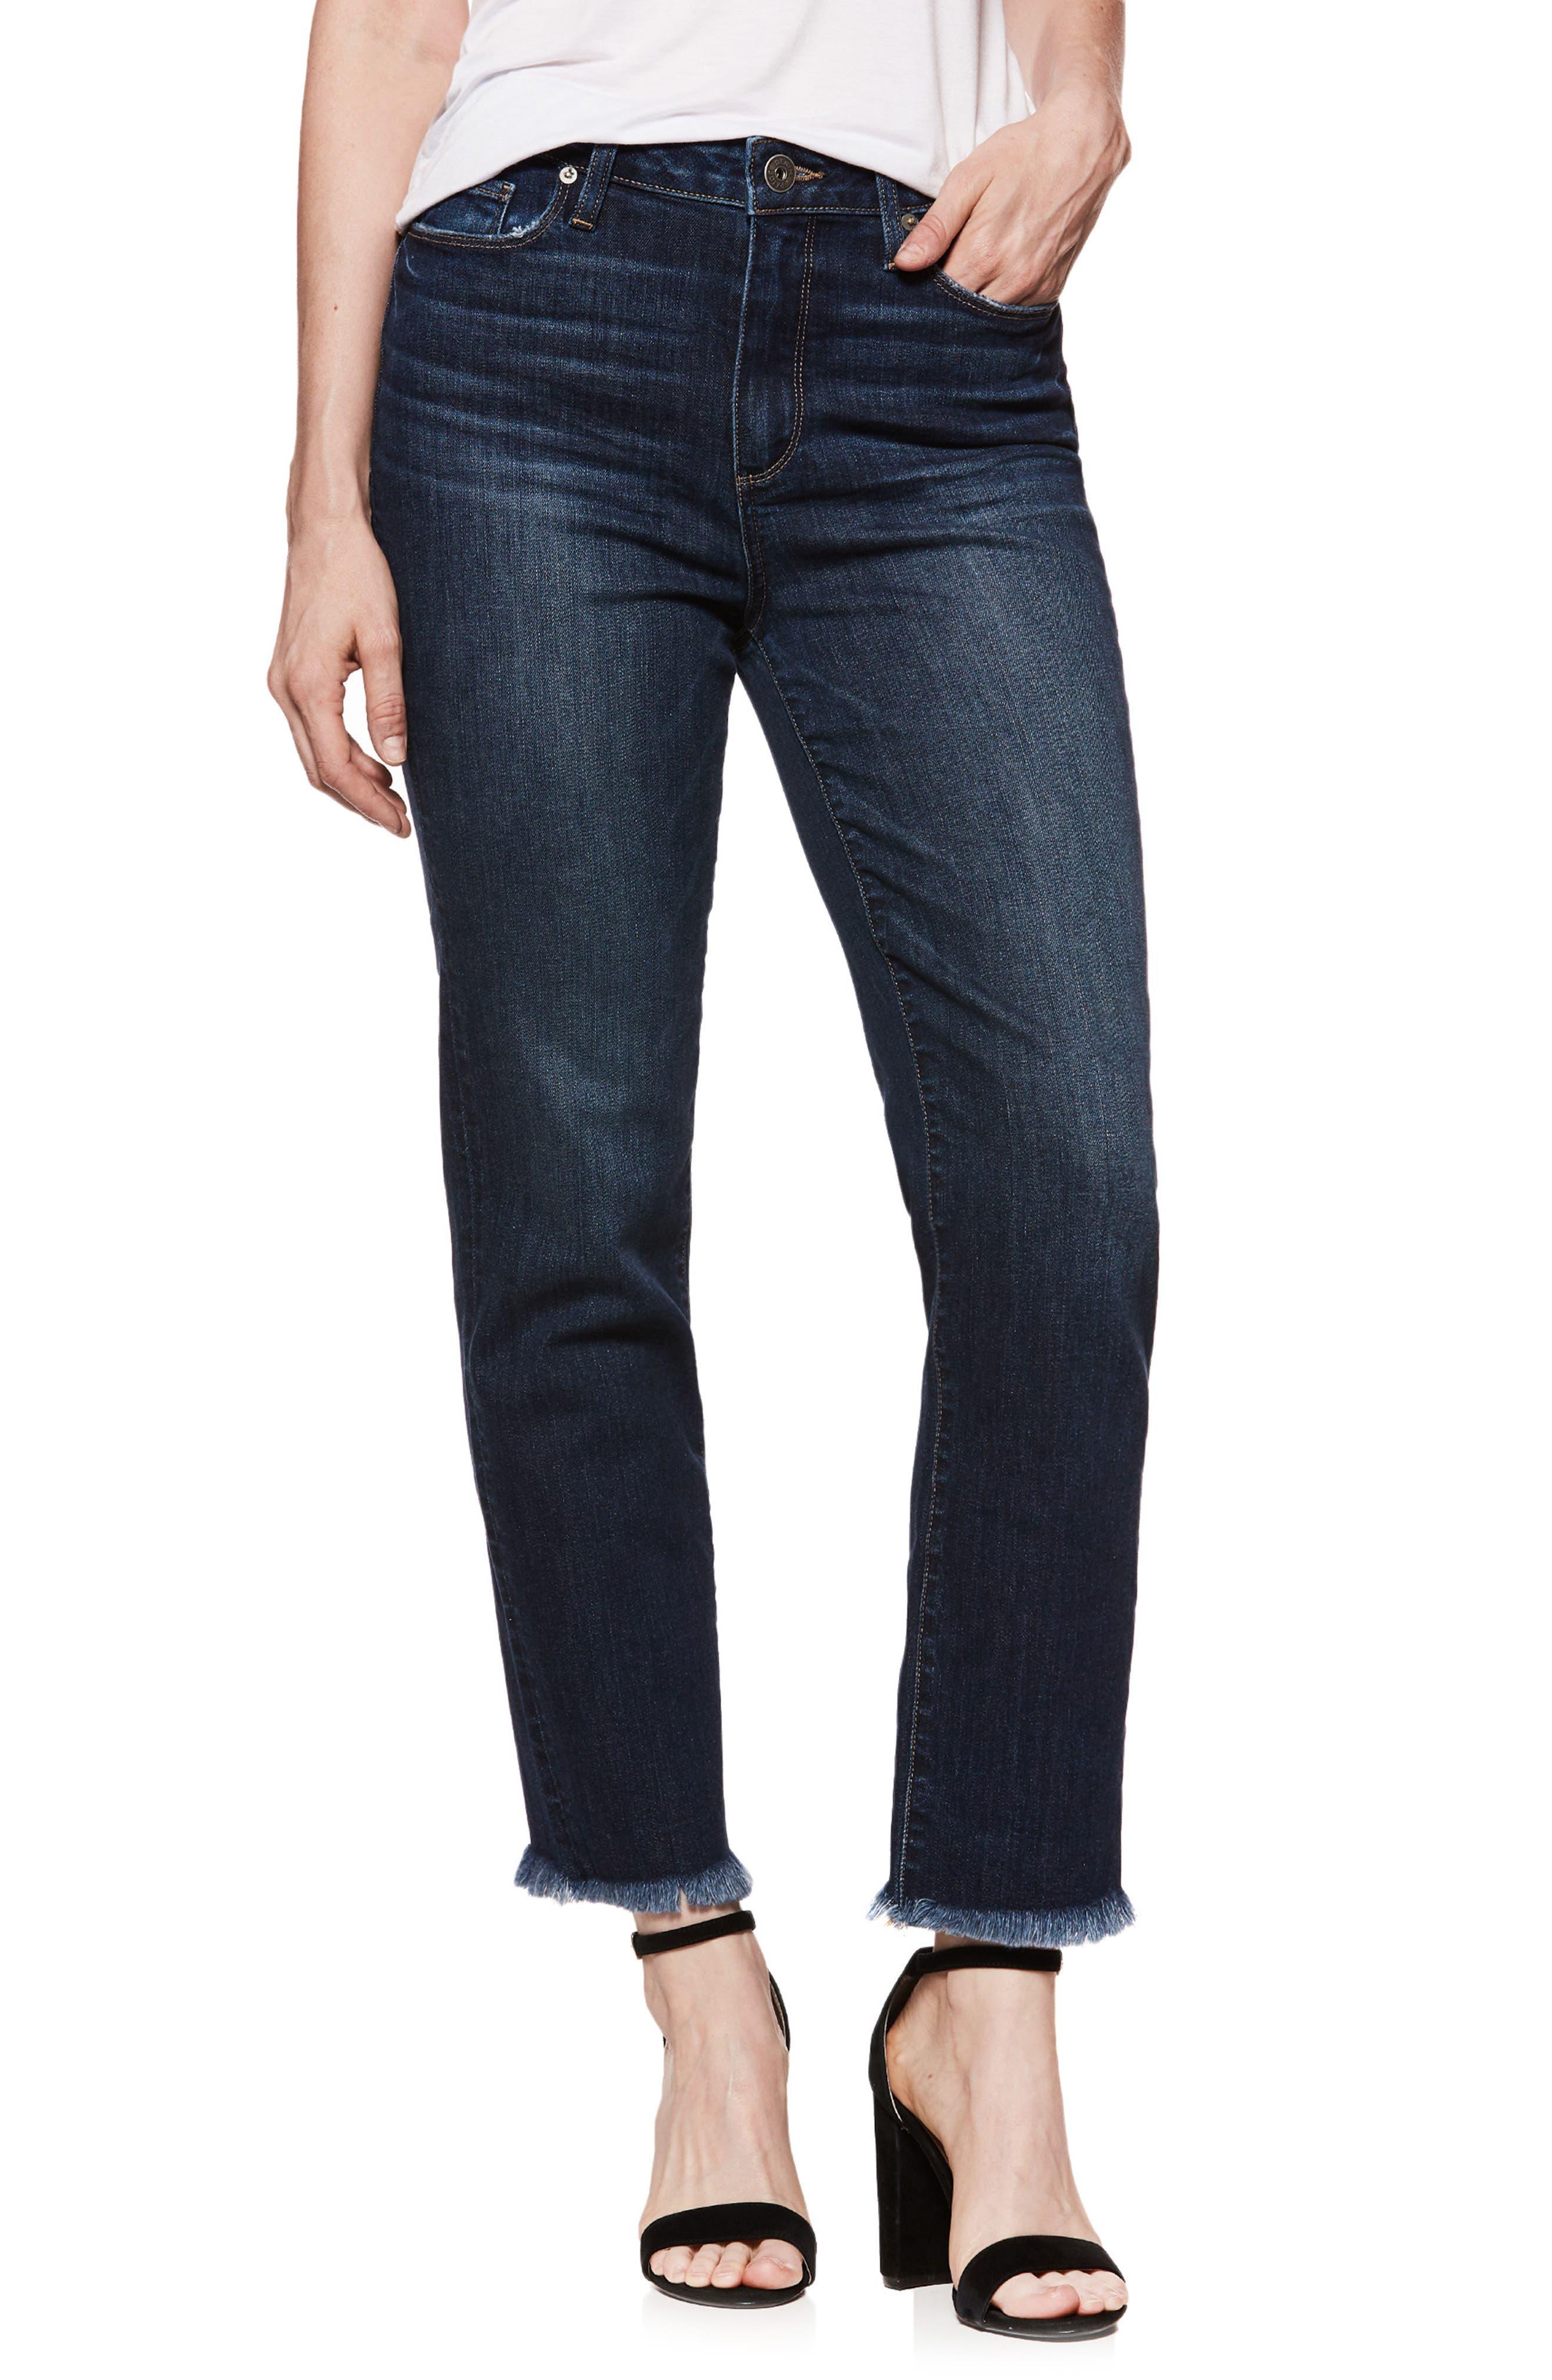 Hoxton High Waist Ankle Straight Leg Jeans,                         Main,                         color, Mazzetti